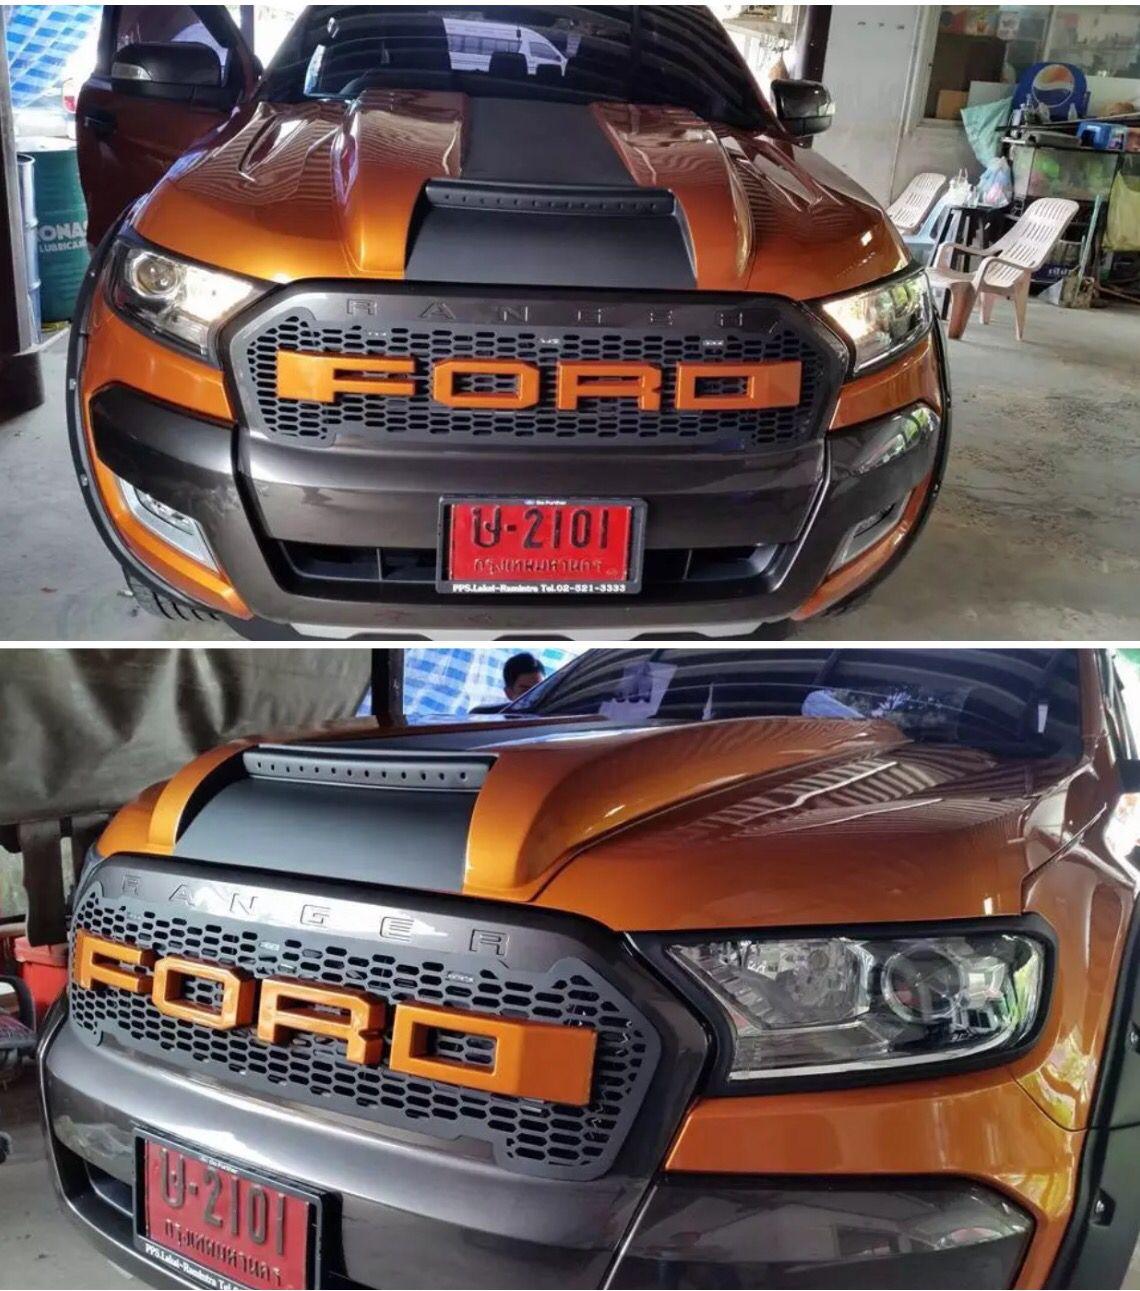 Best 25 ford ranger models ideas only on pinterest 4x4 ford ranger ford ranger and ford ranger pickup